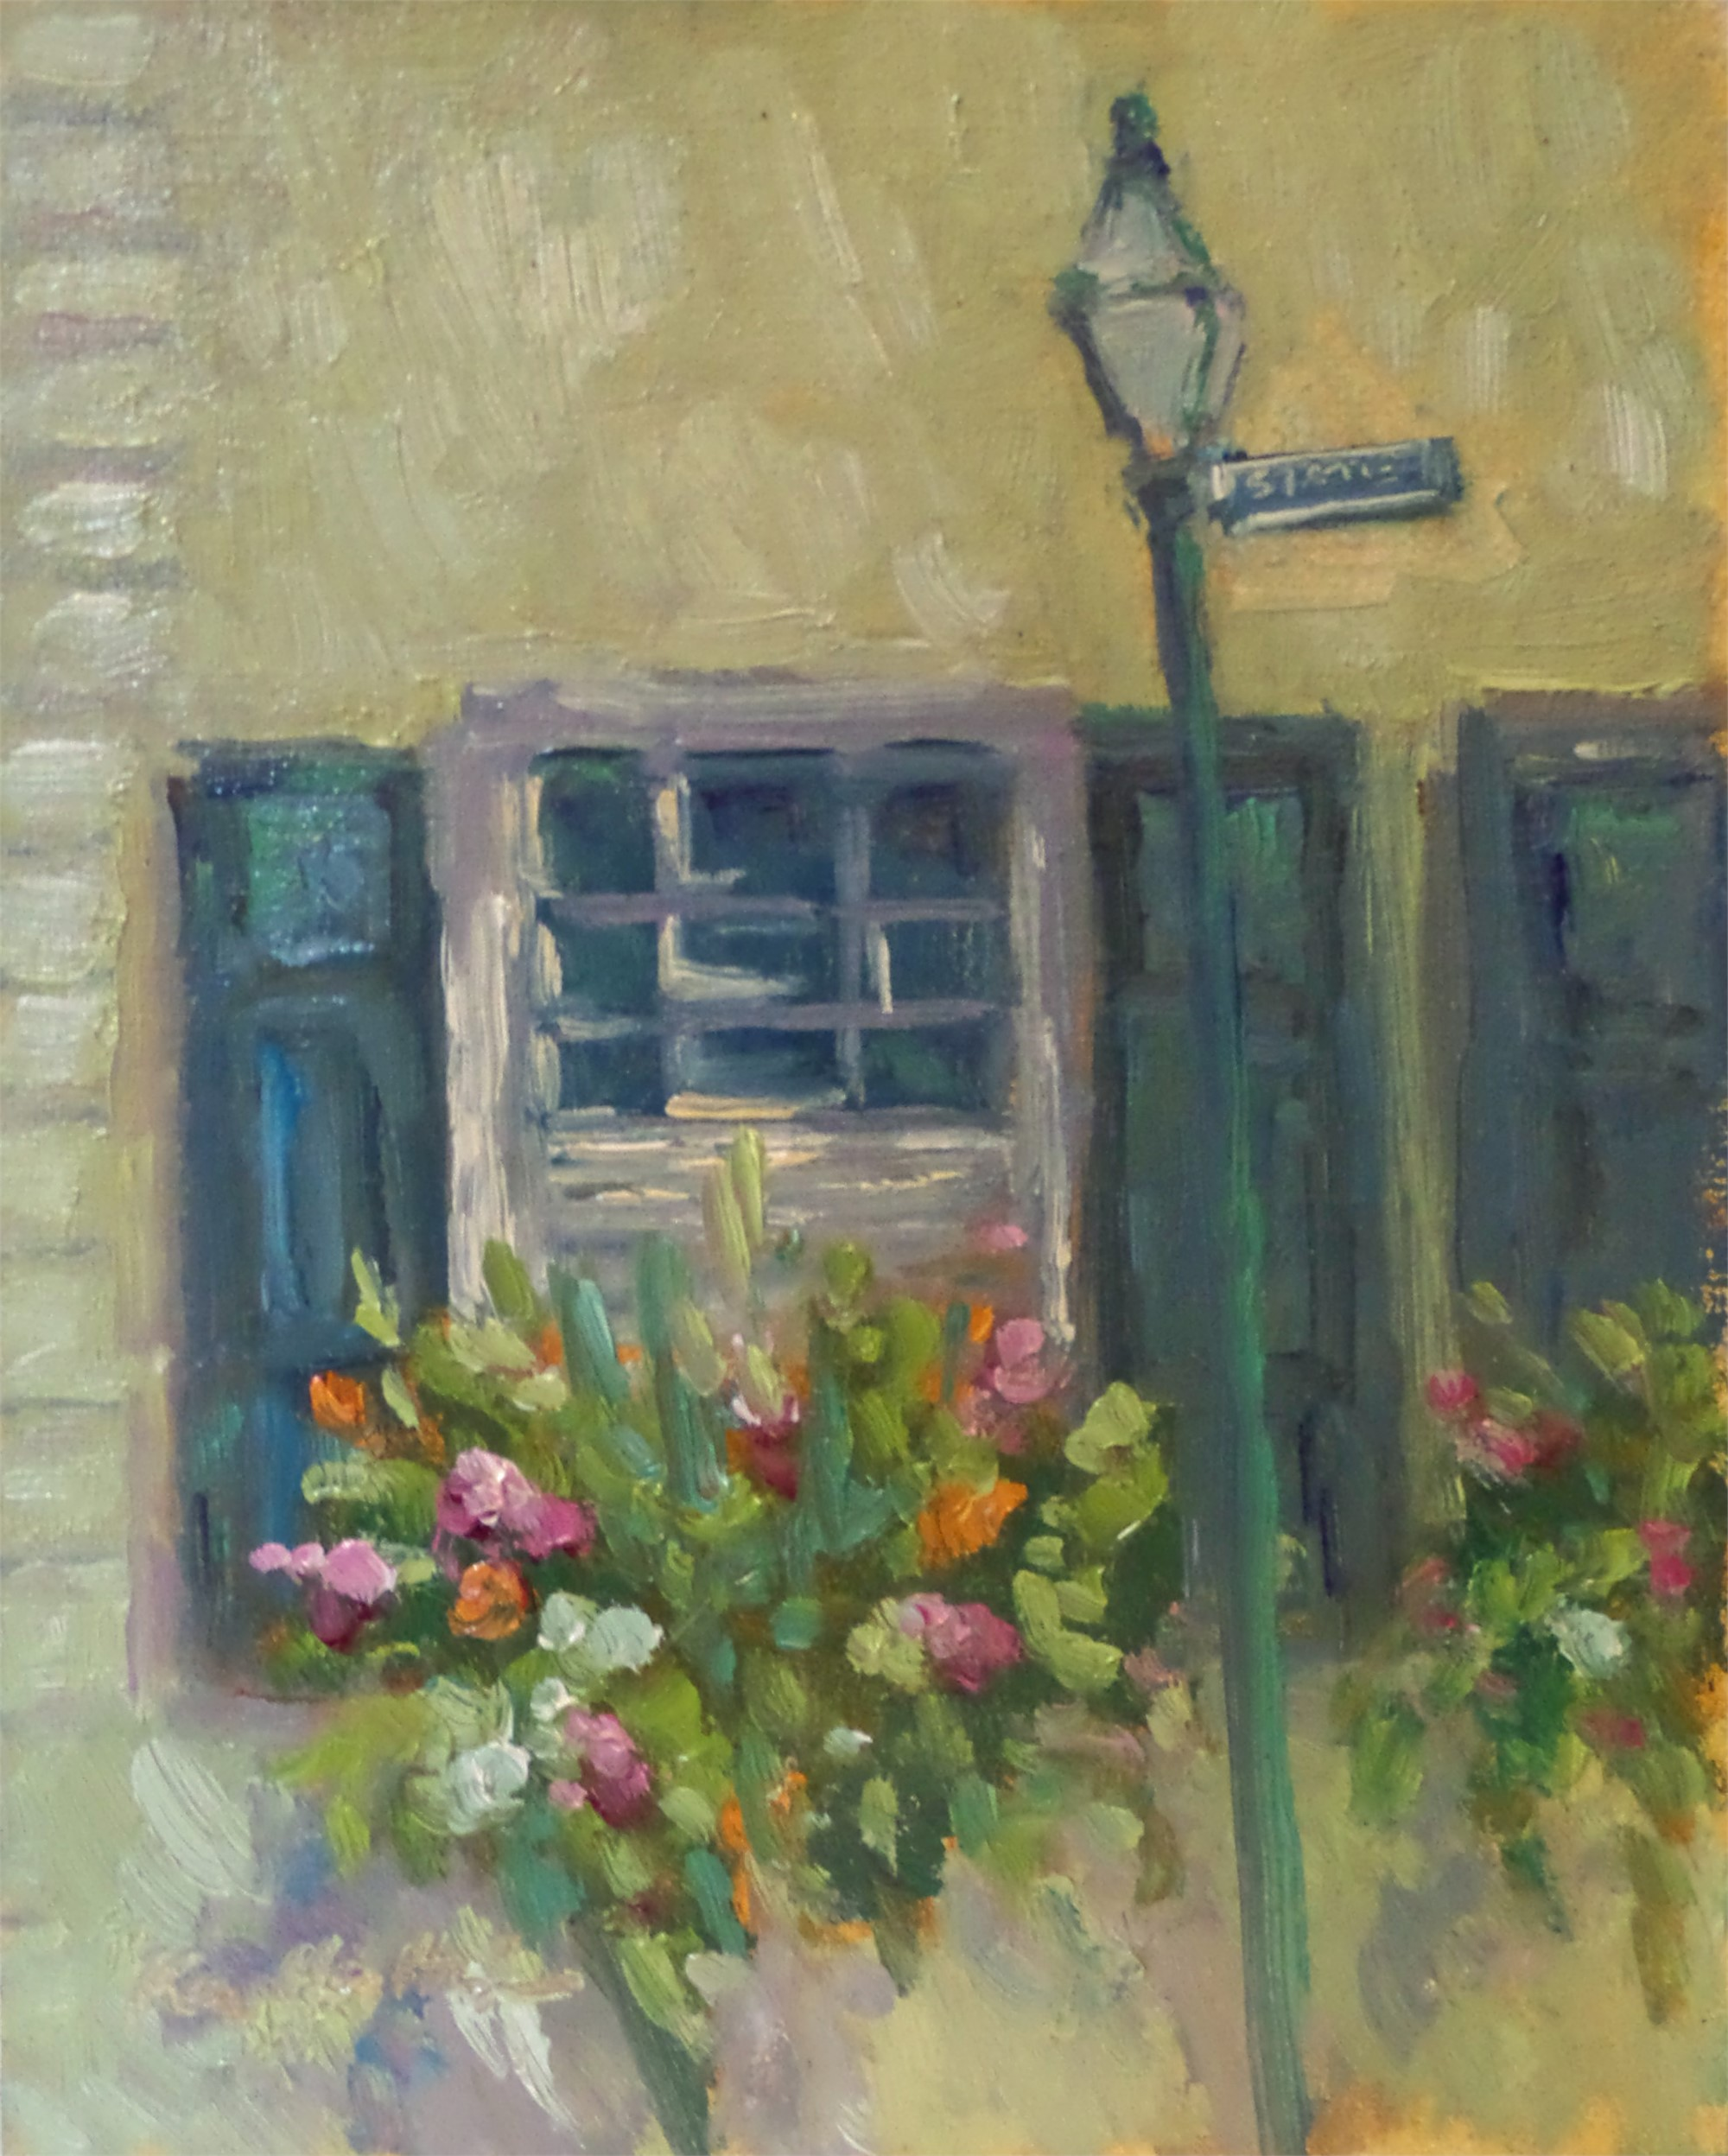 Flowers on State Street by Karen Hewitt Hagan